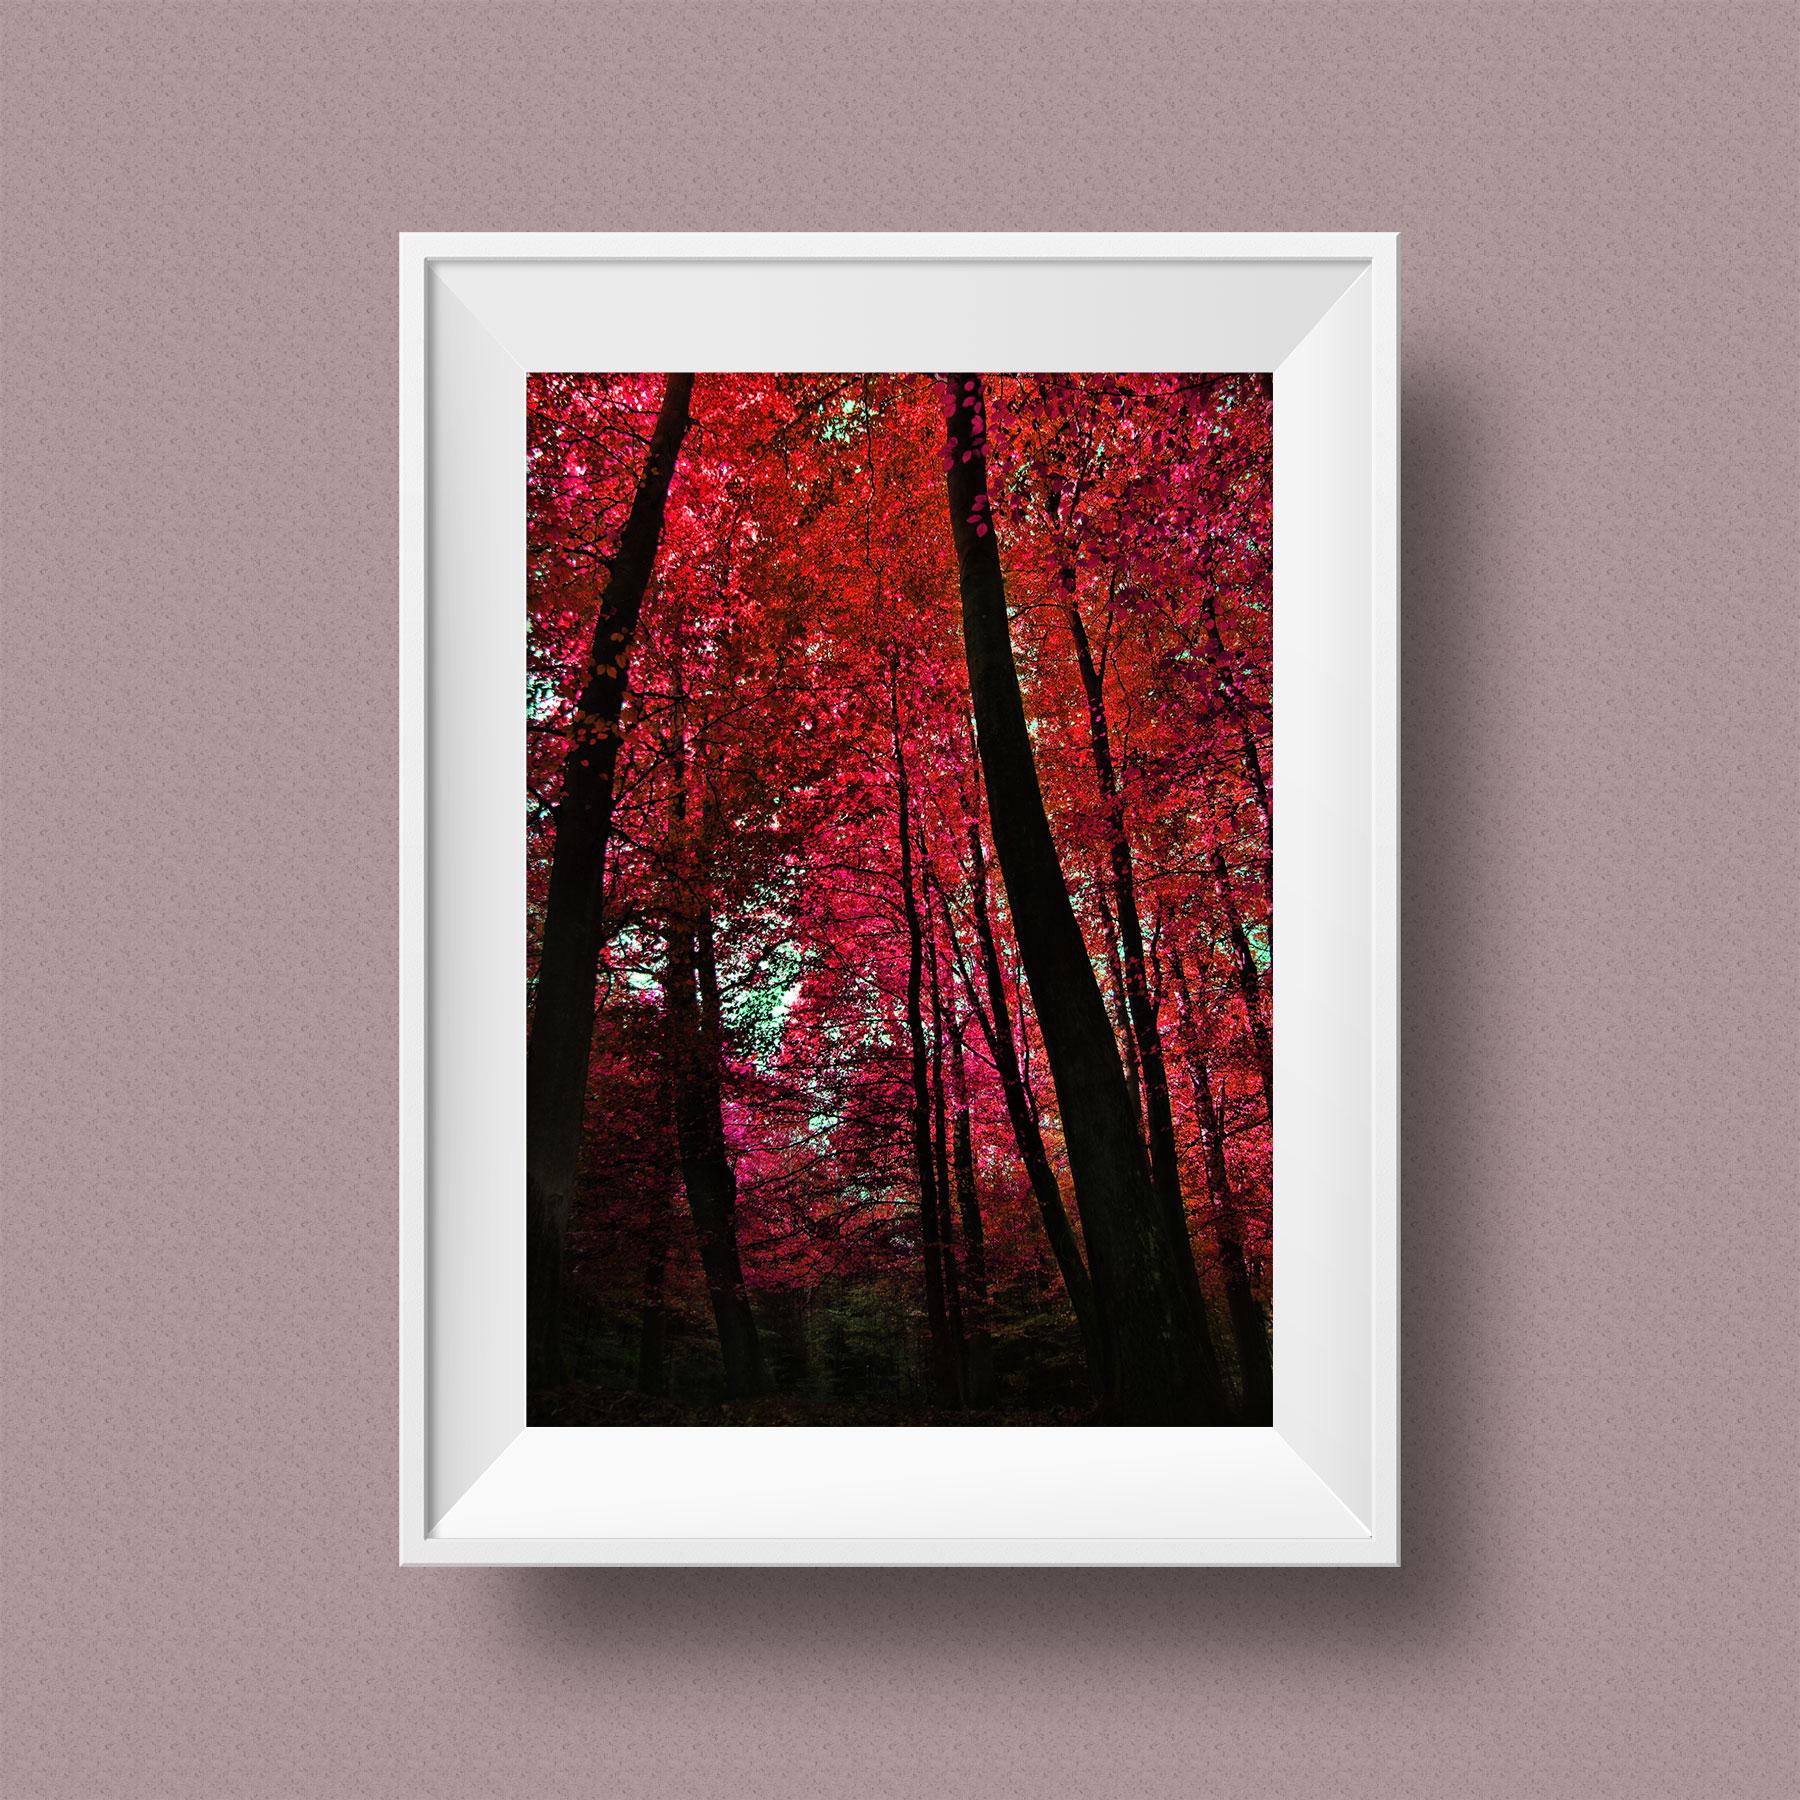 Mocks-Up-Frame-Vbd_RED_Leaves_s.jpg